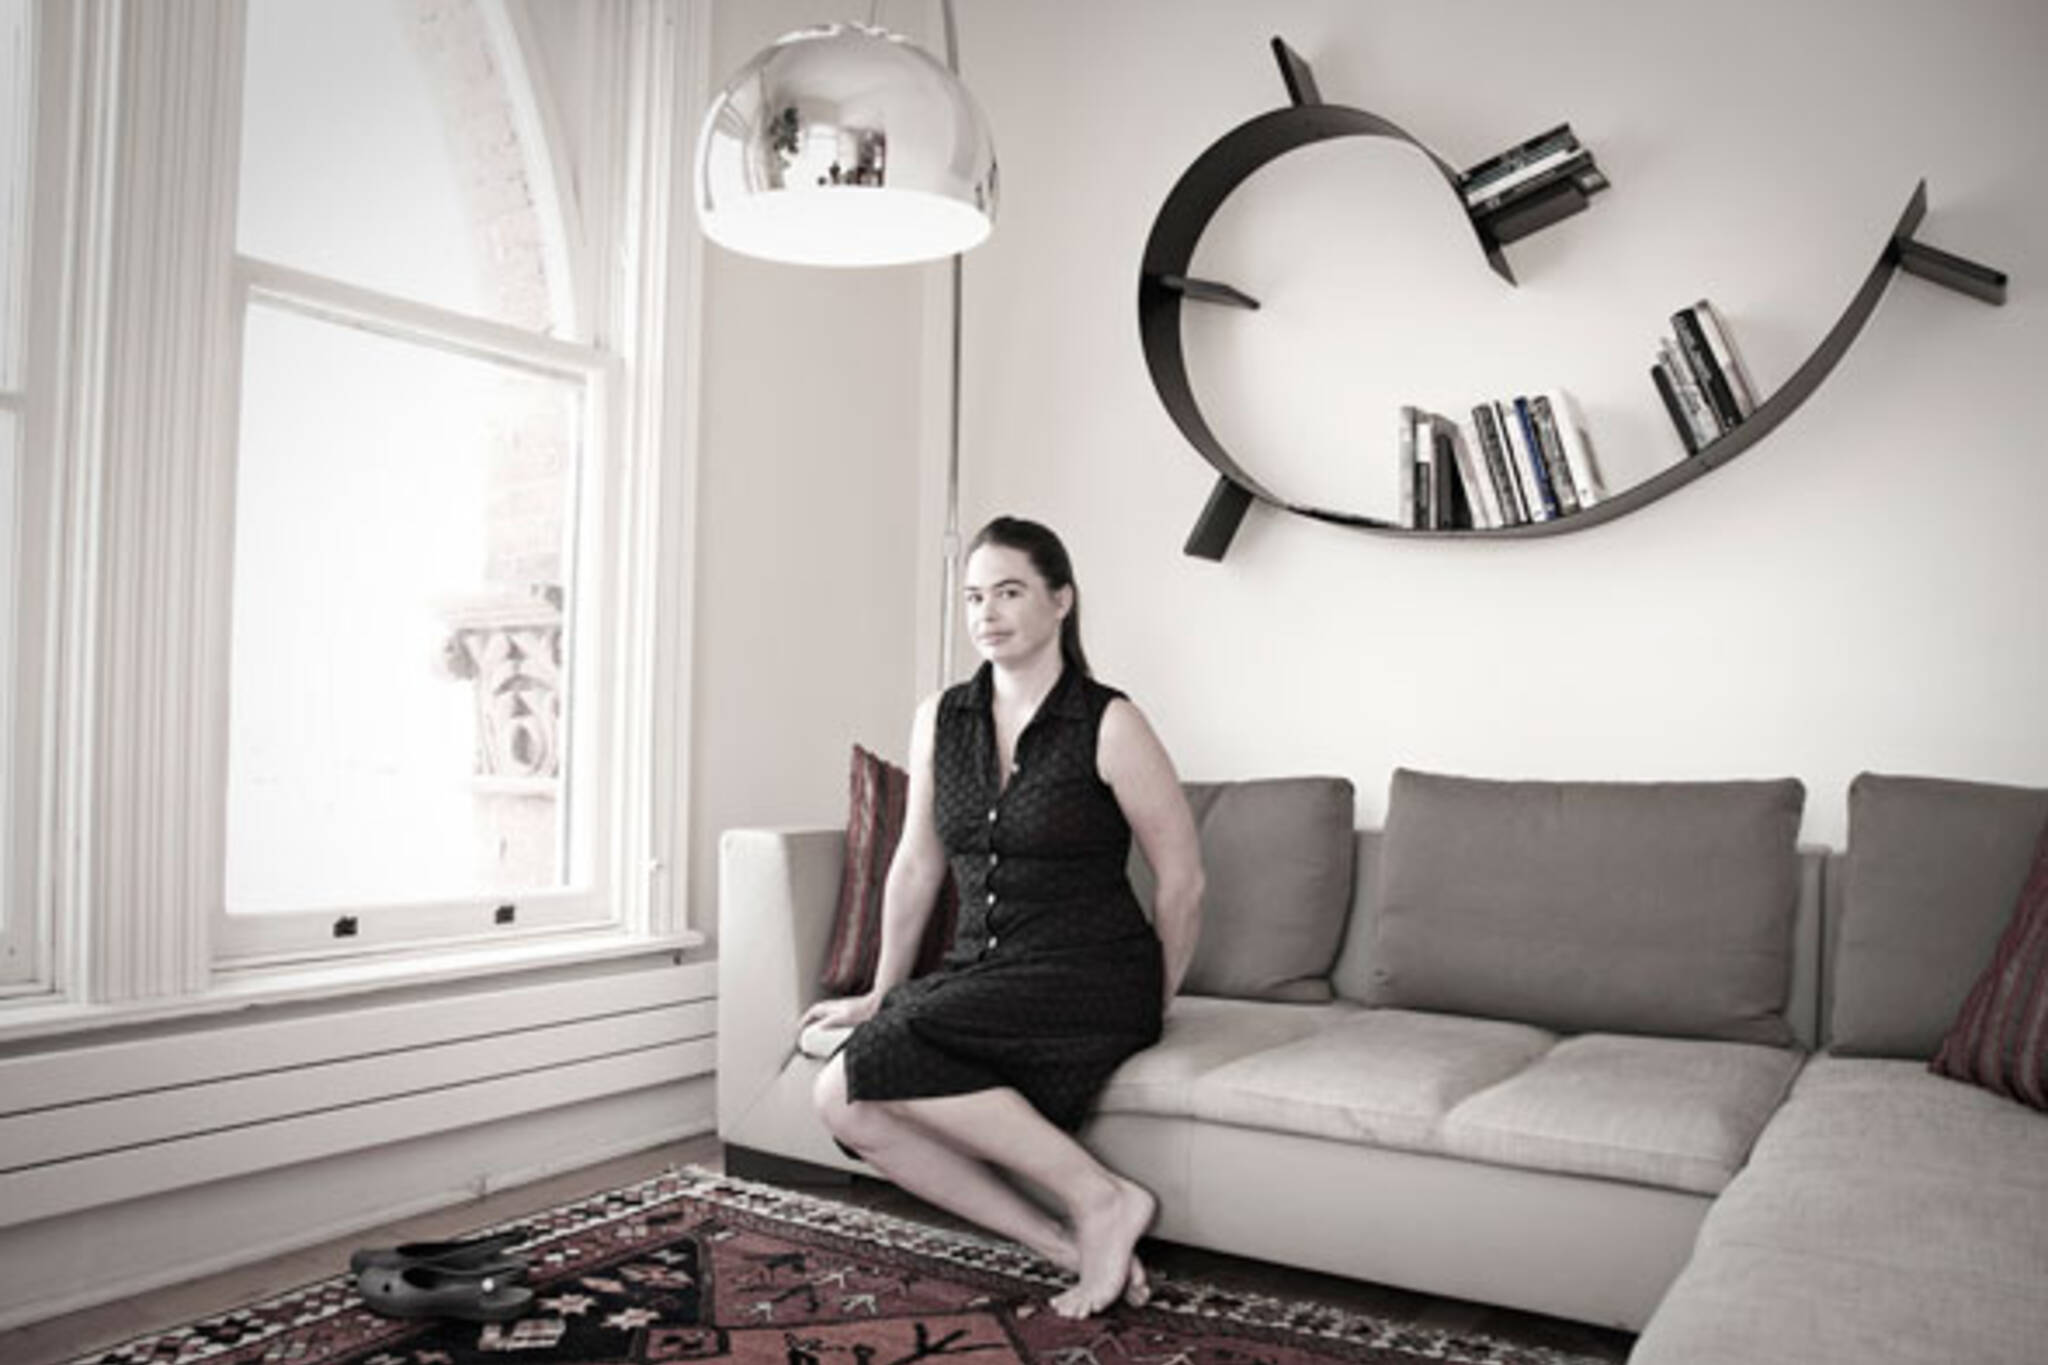 Christina Zeidler